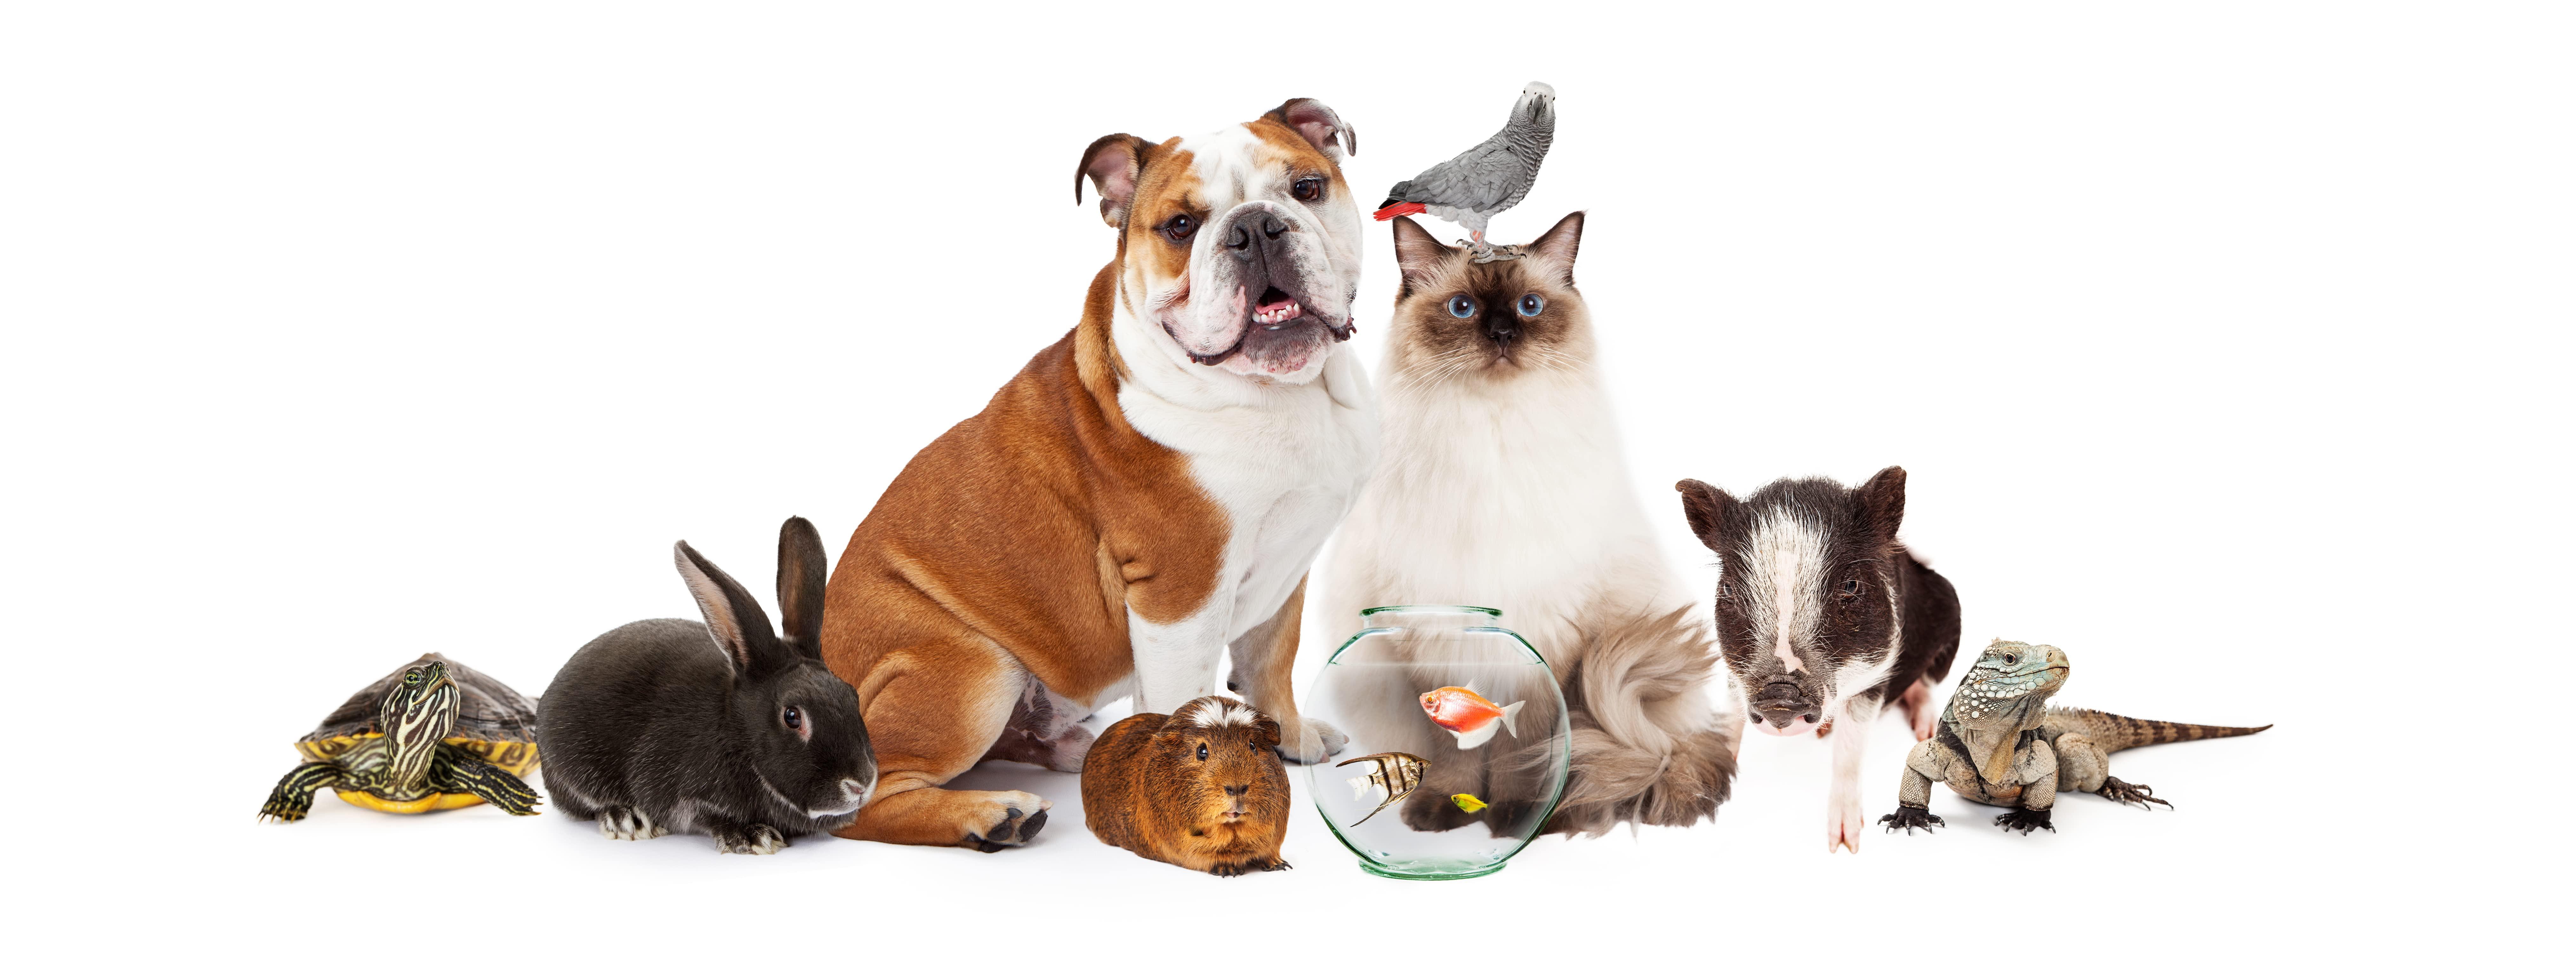 Venda Produtos Pet Online  no Marketplace Amazon